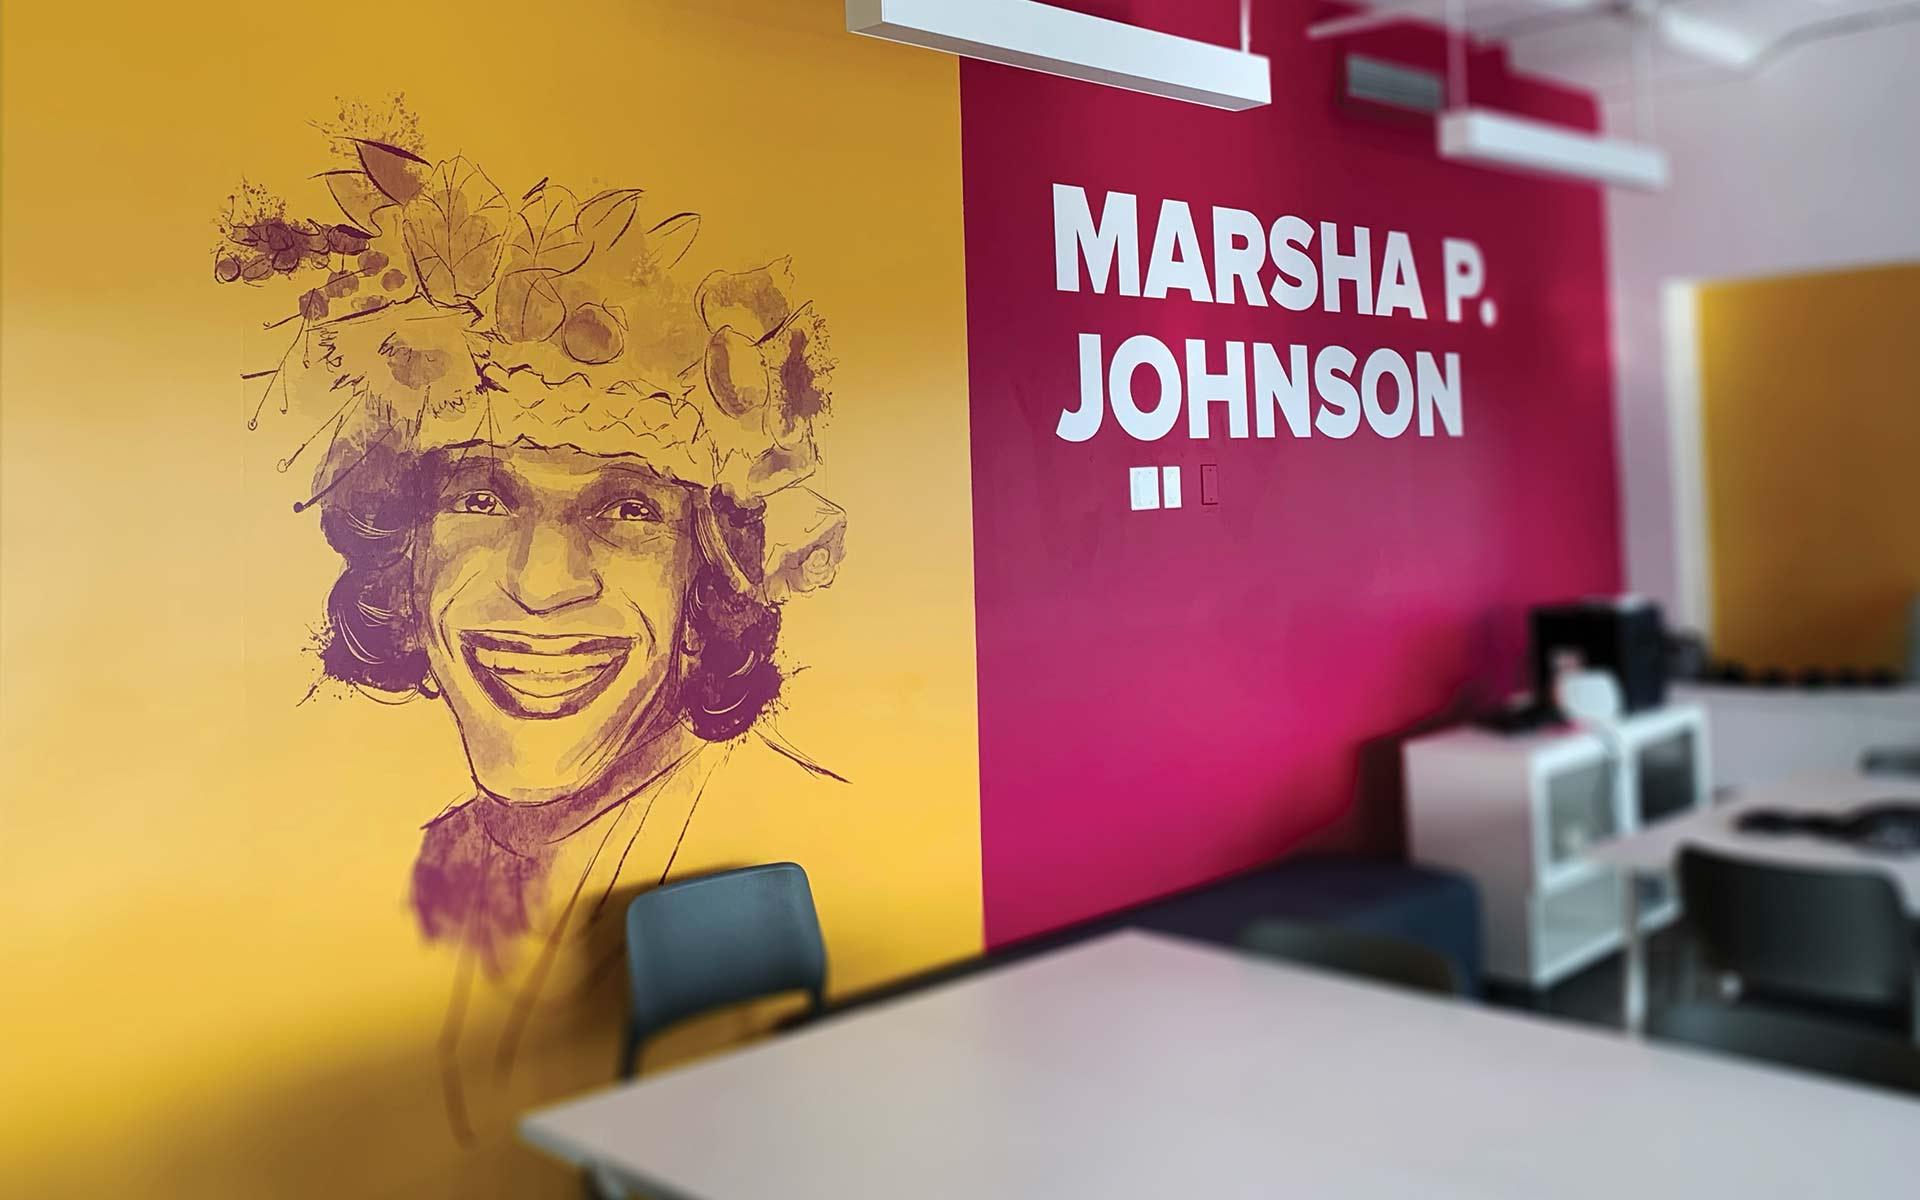 Marsha P. Johnson wall decal at GLSEN's office